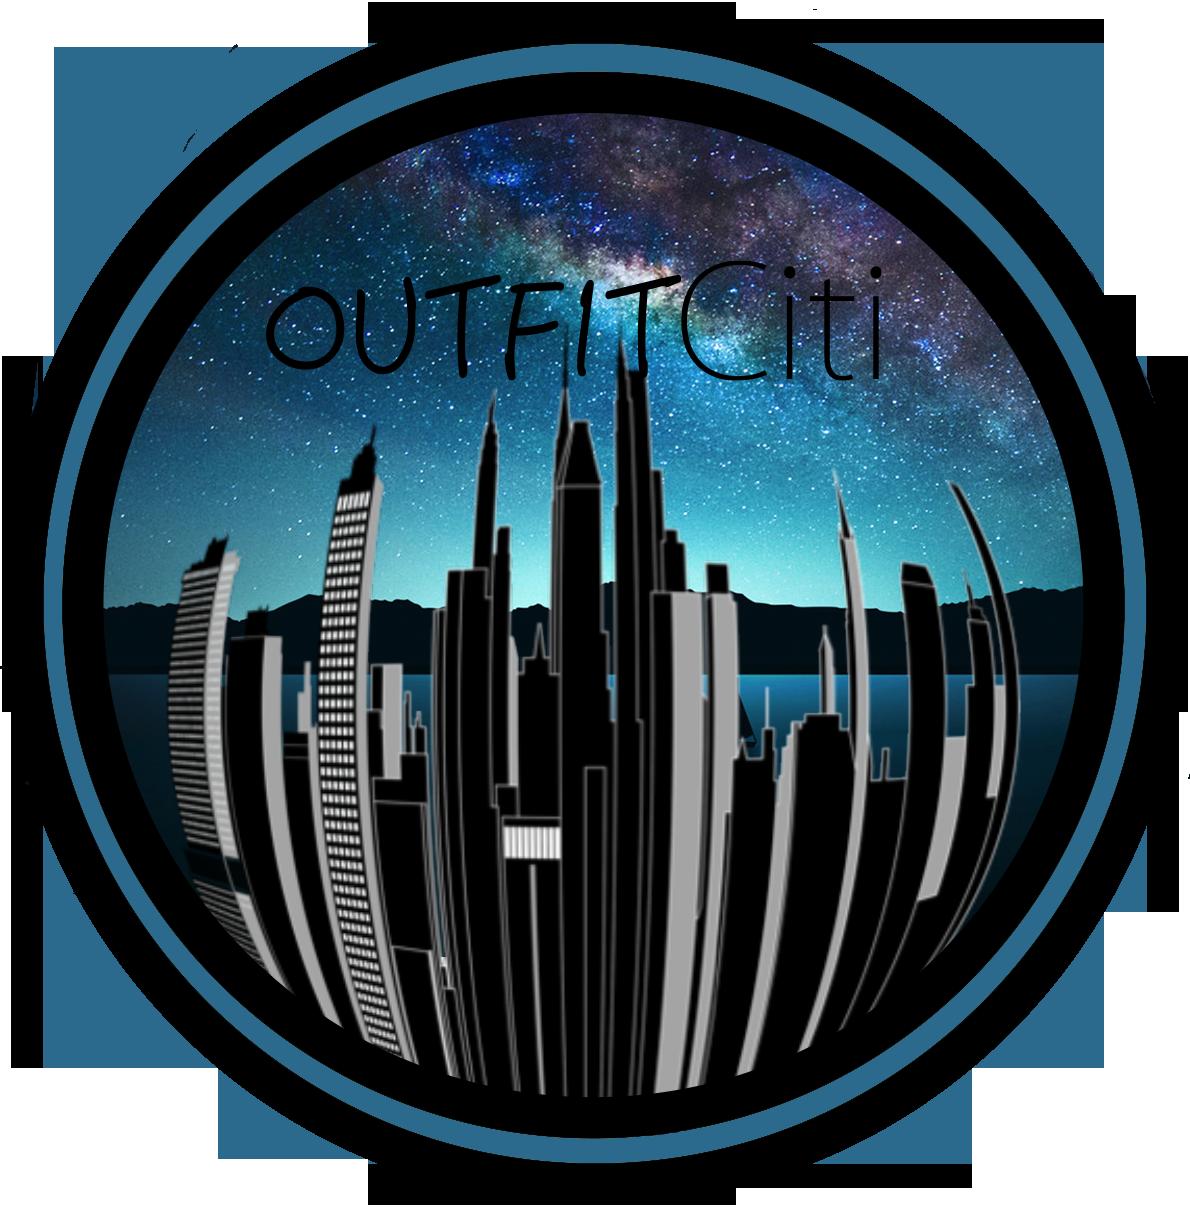 OutfitCiti